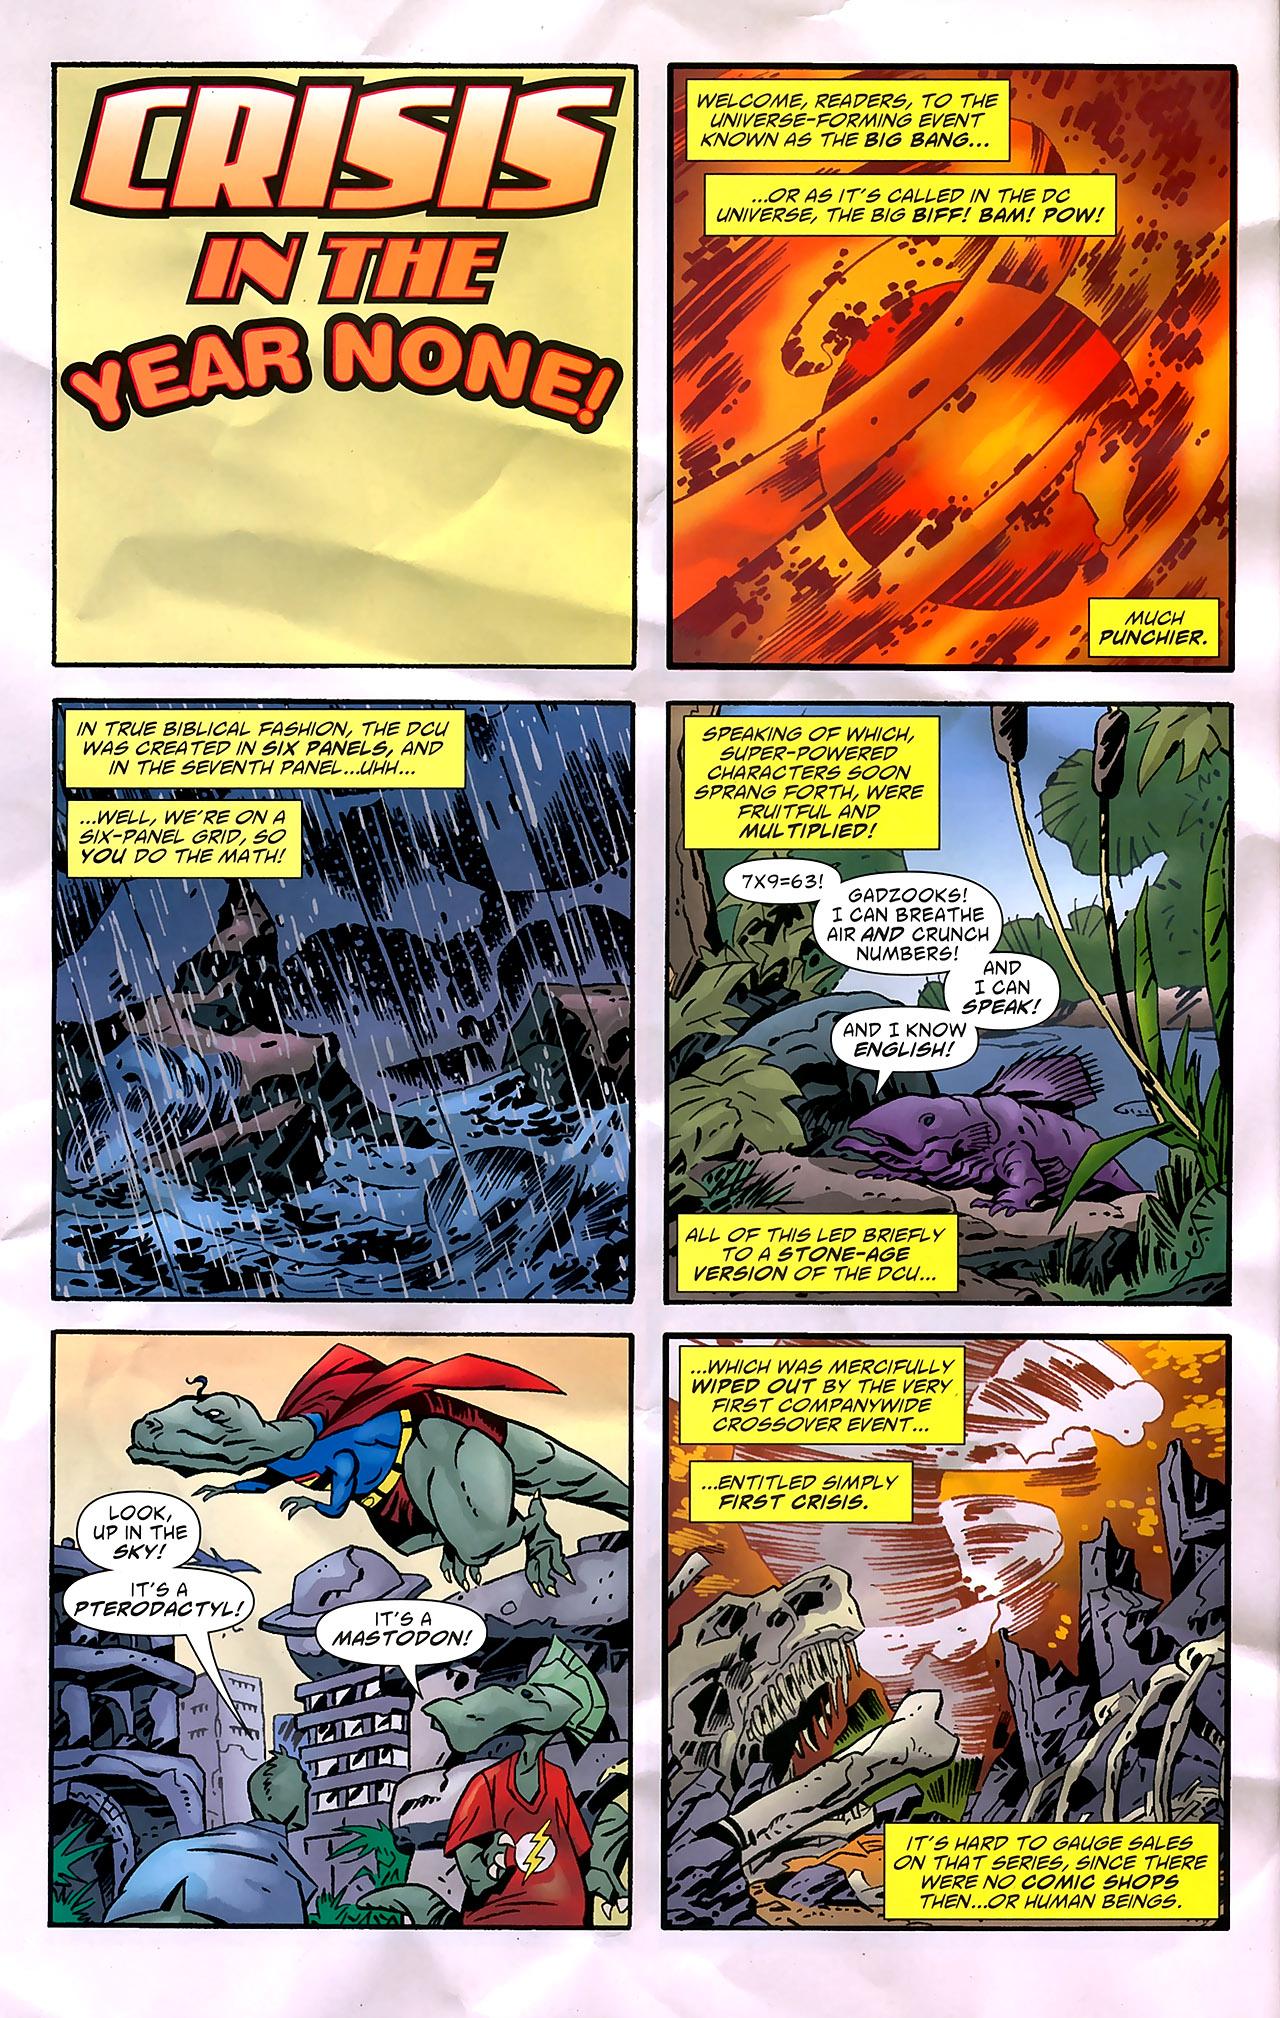 Read online Ambush Bug: Year None comic -  Issue #7 - 8